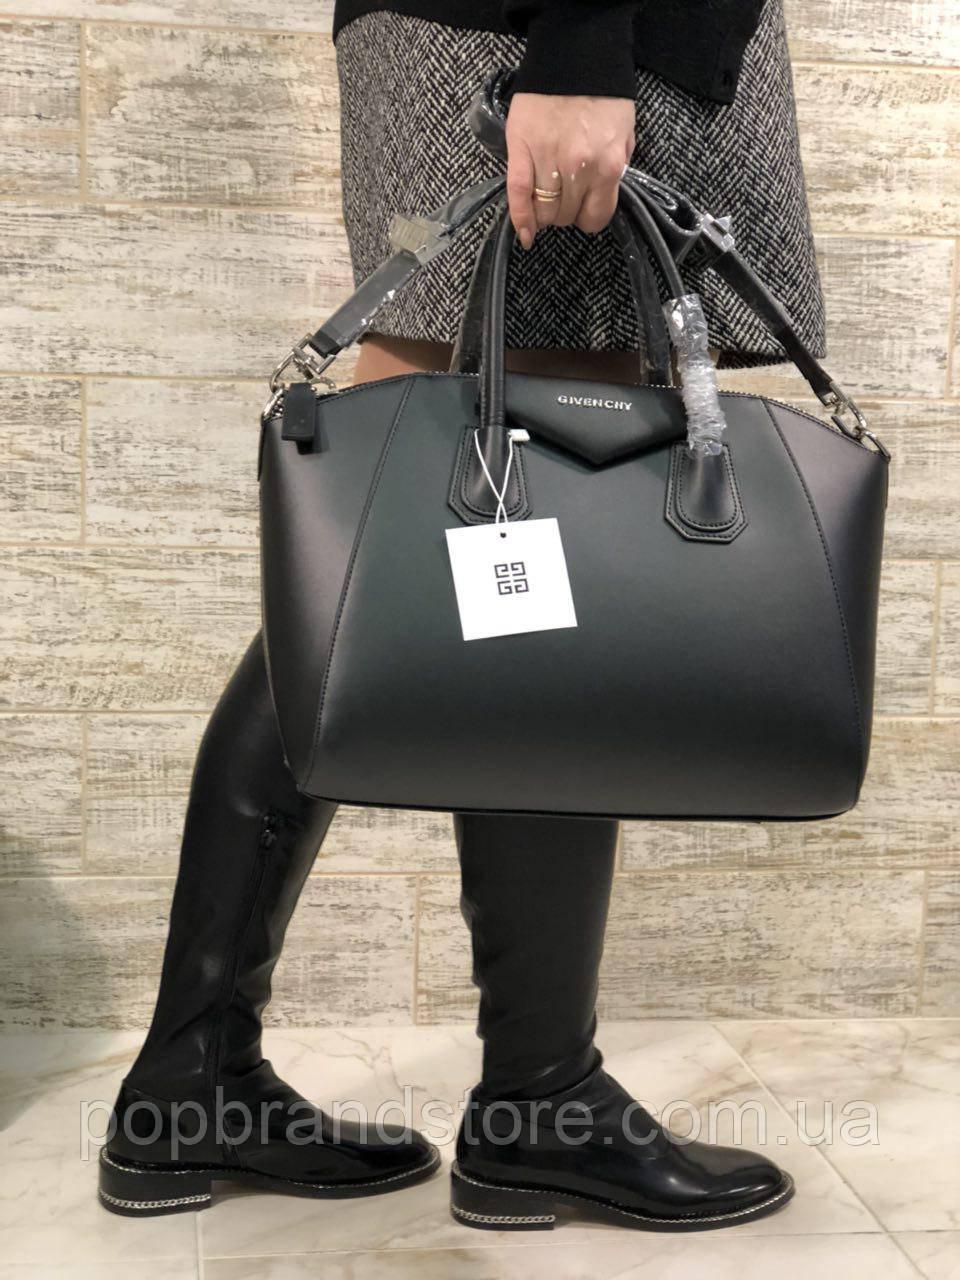 Сумка GIVENCHY ANTIGONA гладкая кожа (реплика) - Pop Brand Store   брендовые  сумки, 7917f465b4e